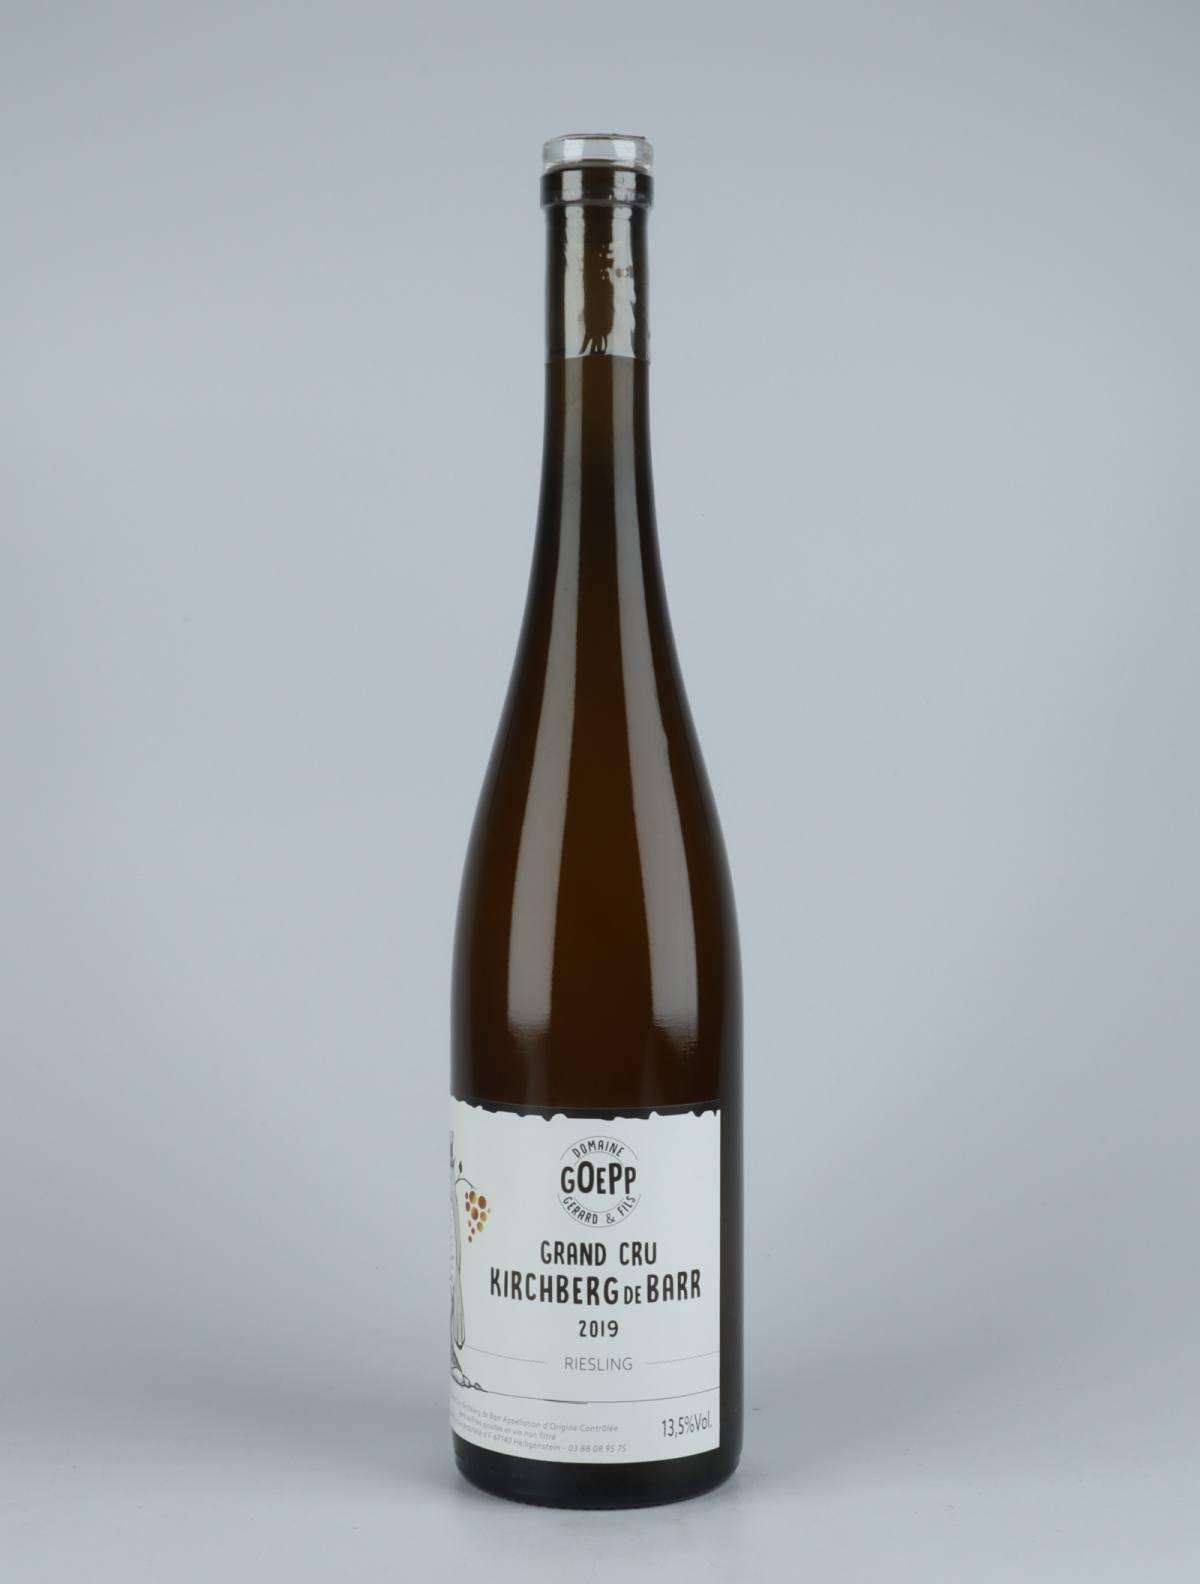 Riesling - Grand Cru Kirchberg